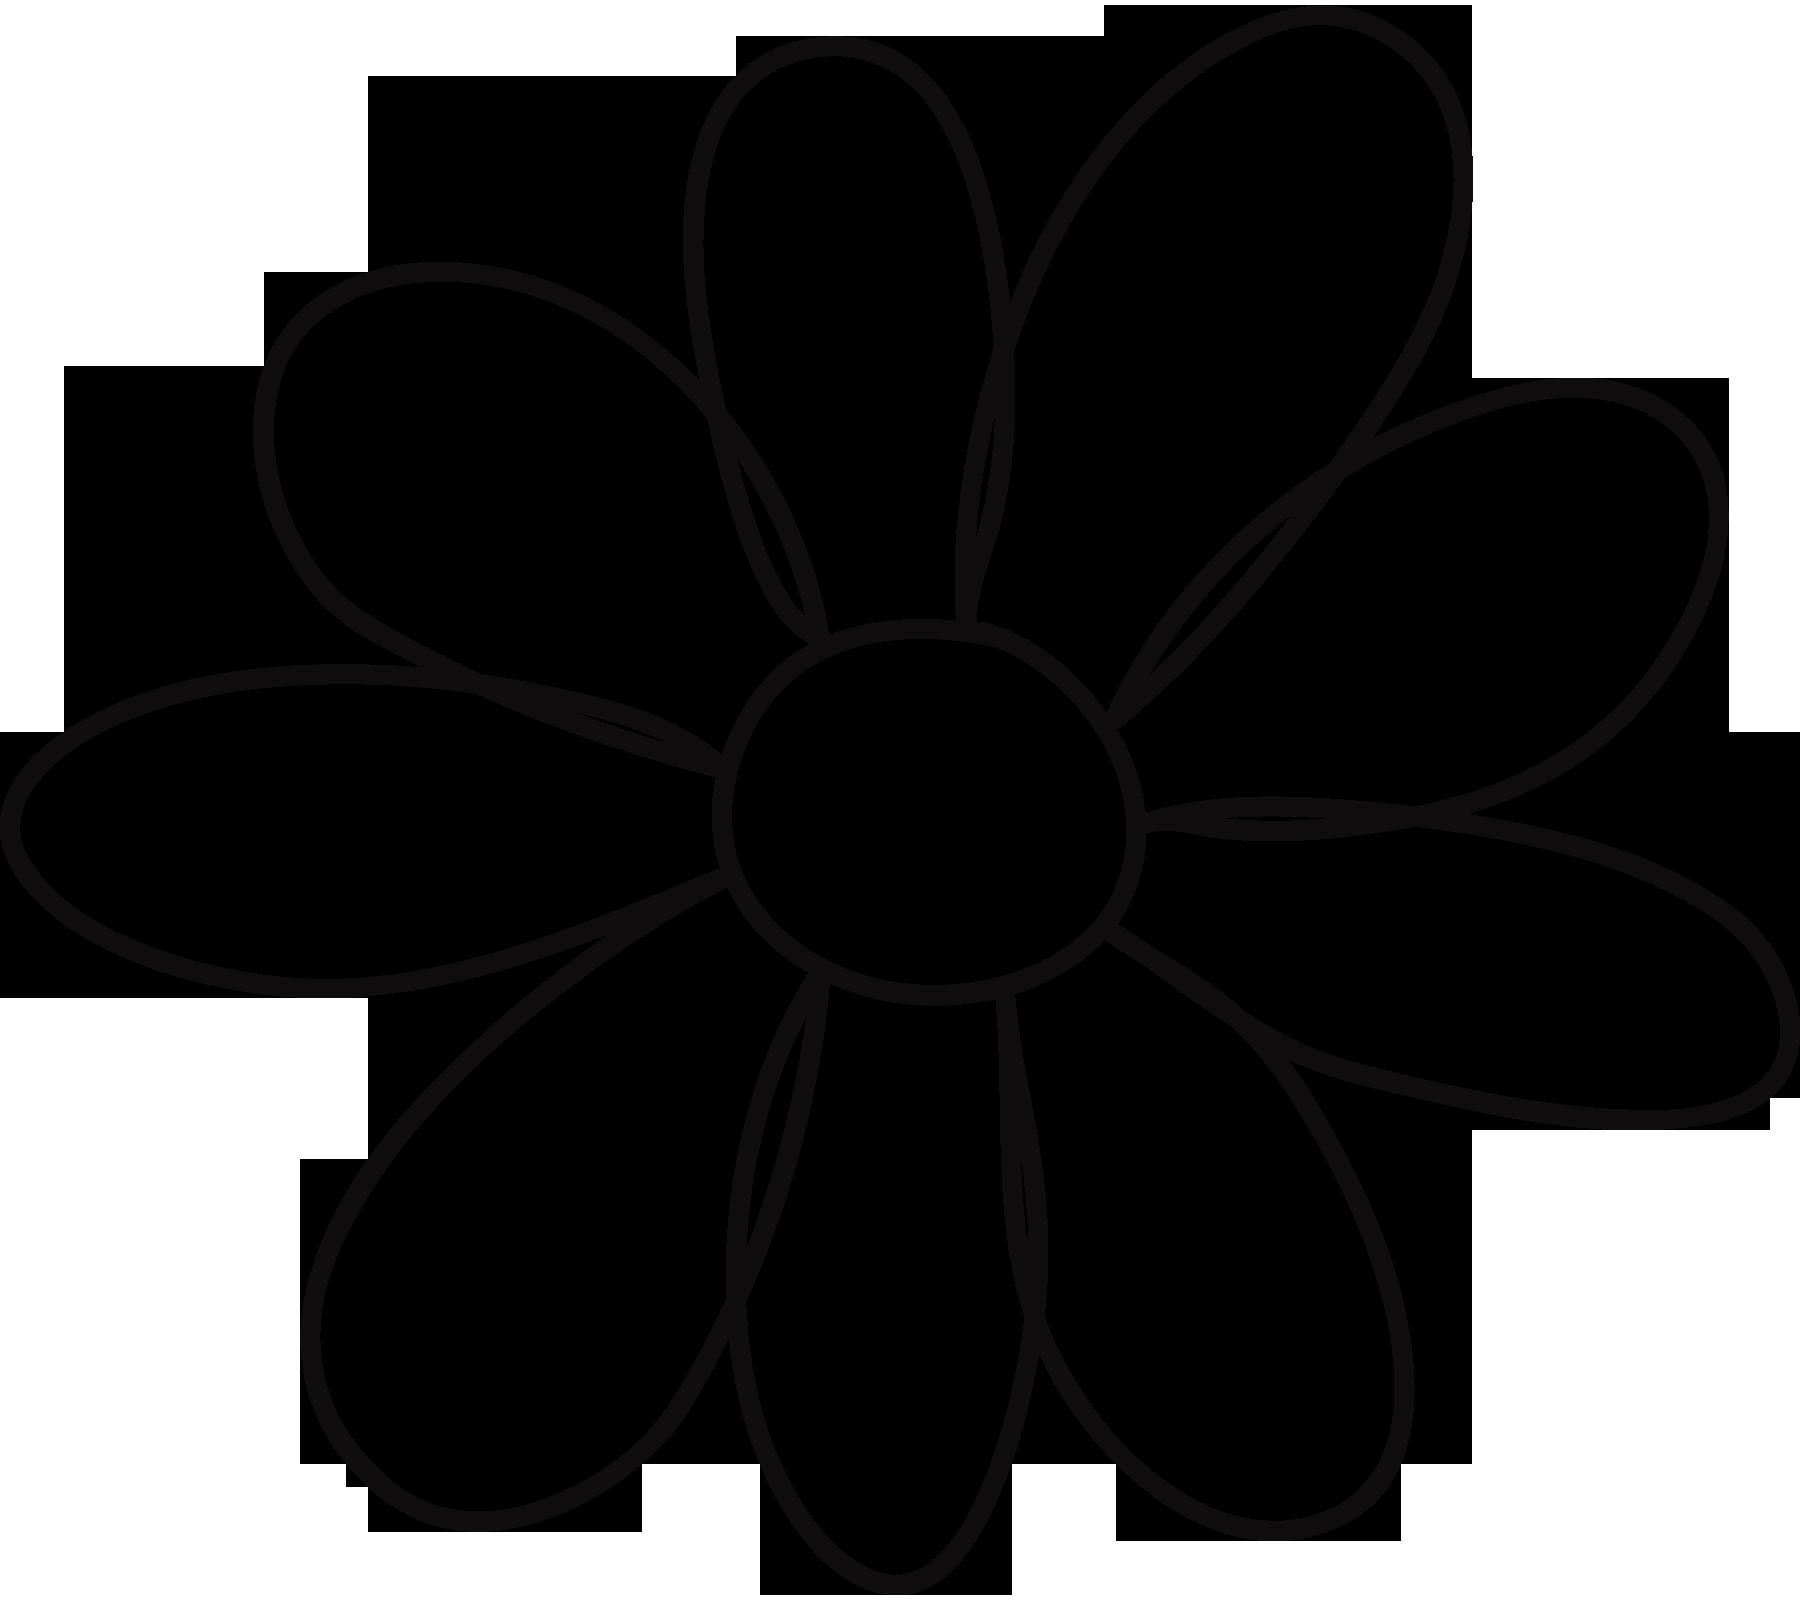 Flower Petals Drawing